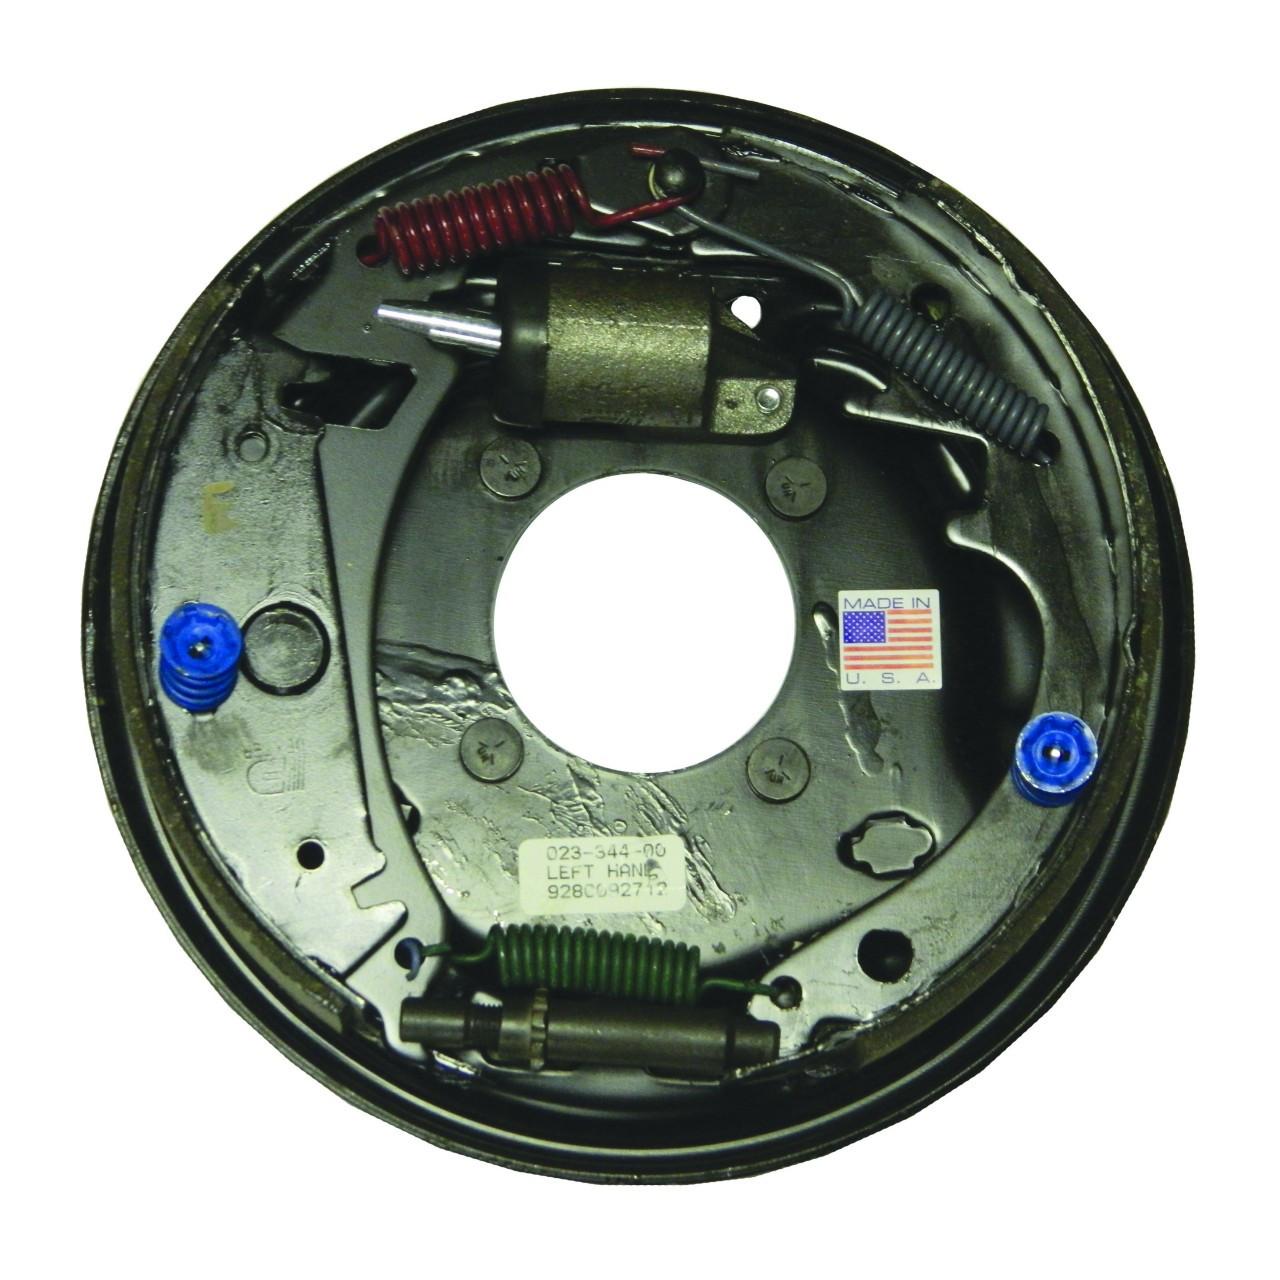 "23-344 --- 10"" Dexter Free-Backing Hydraulic Brake - Left Hand Assembly - 3.5k"